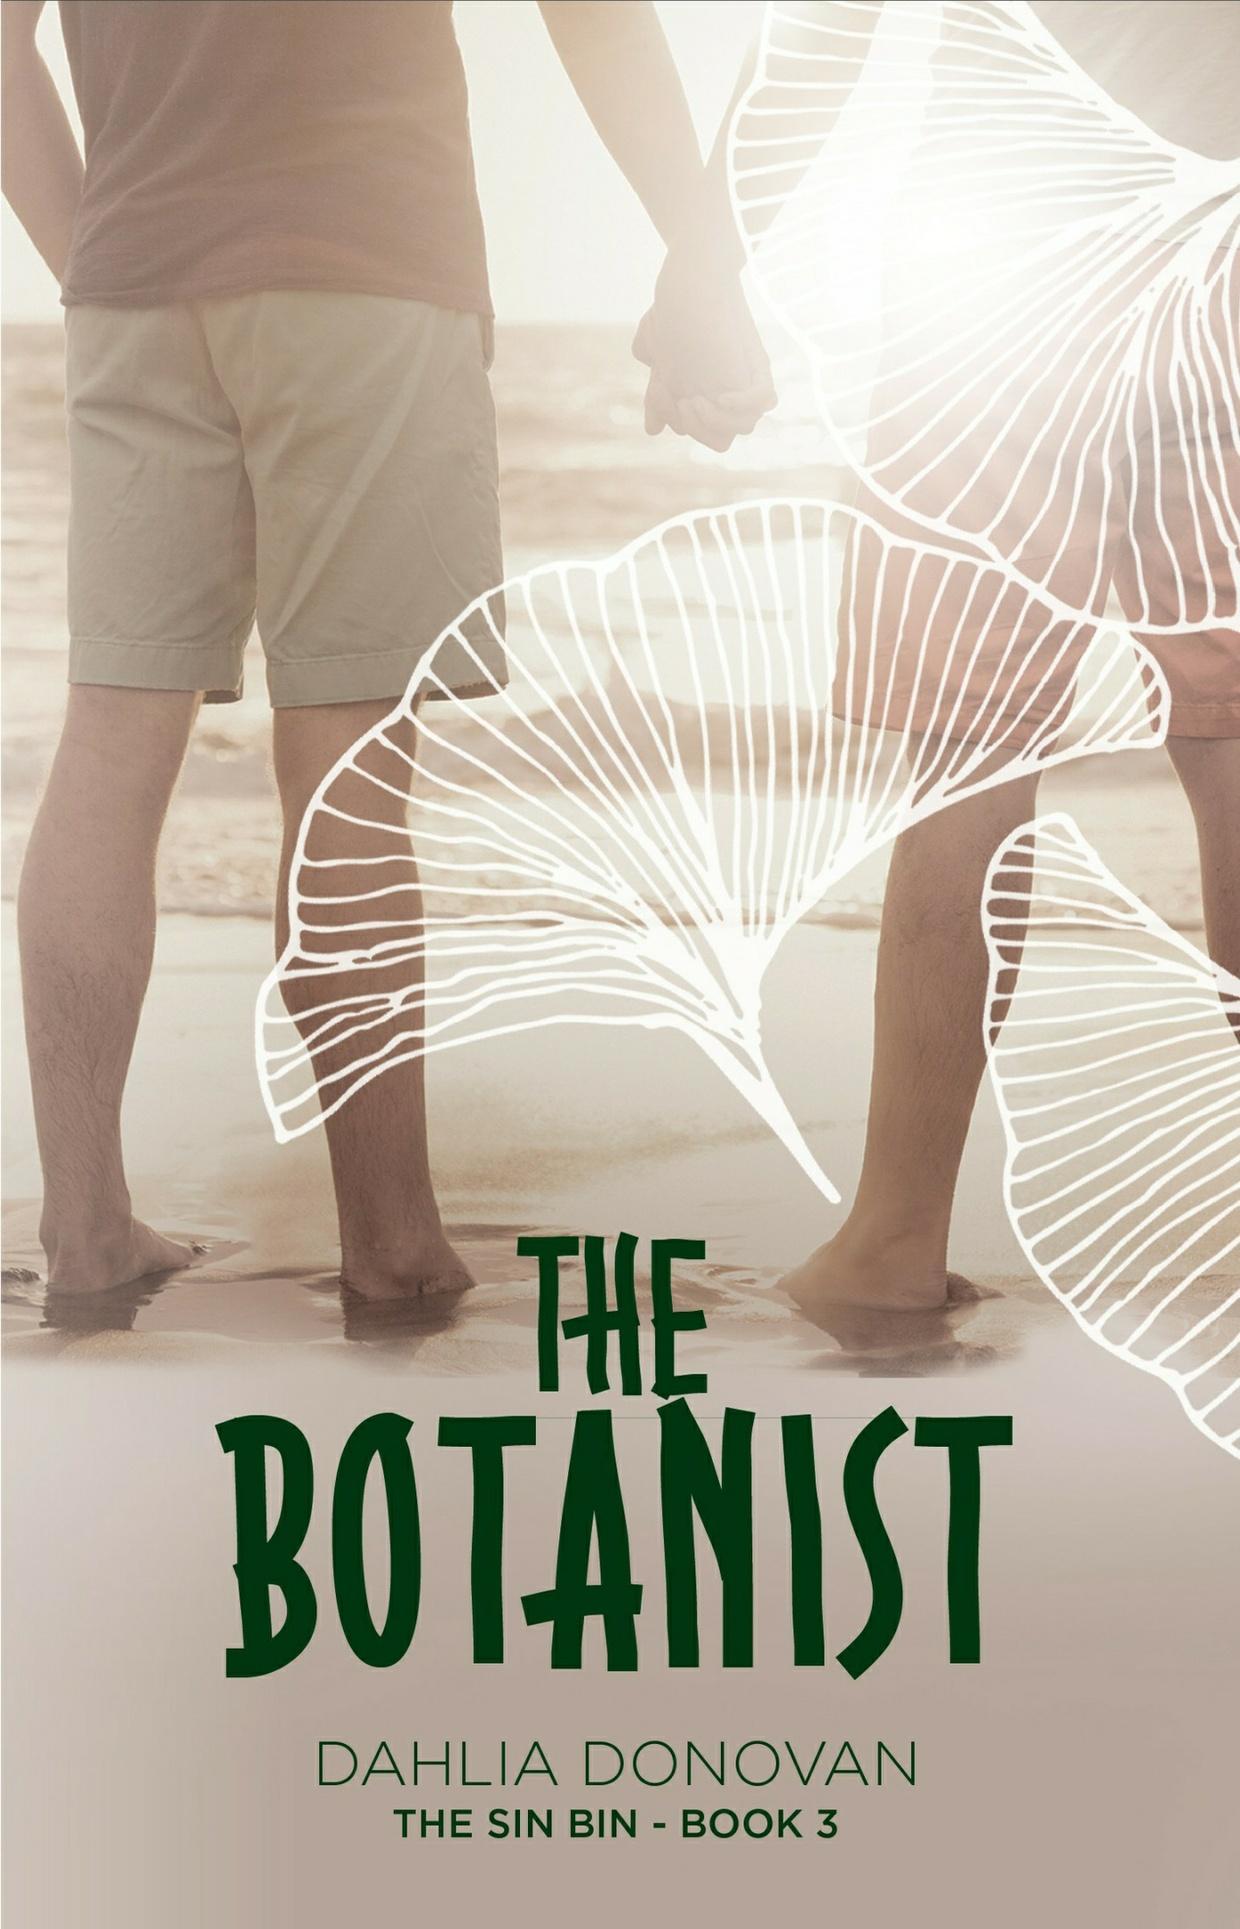 Epub The Botanist by Dahlia Donovan